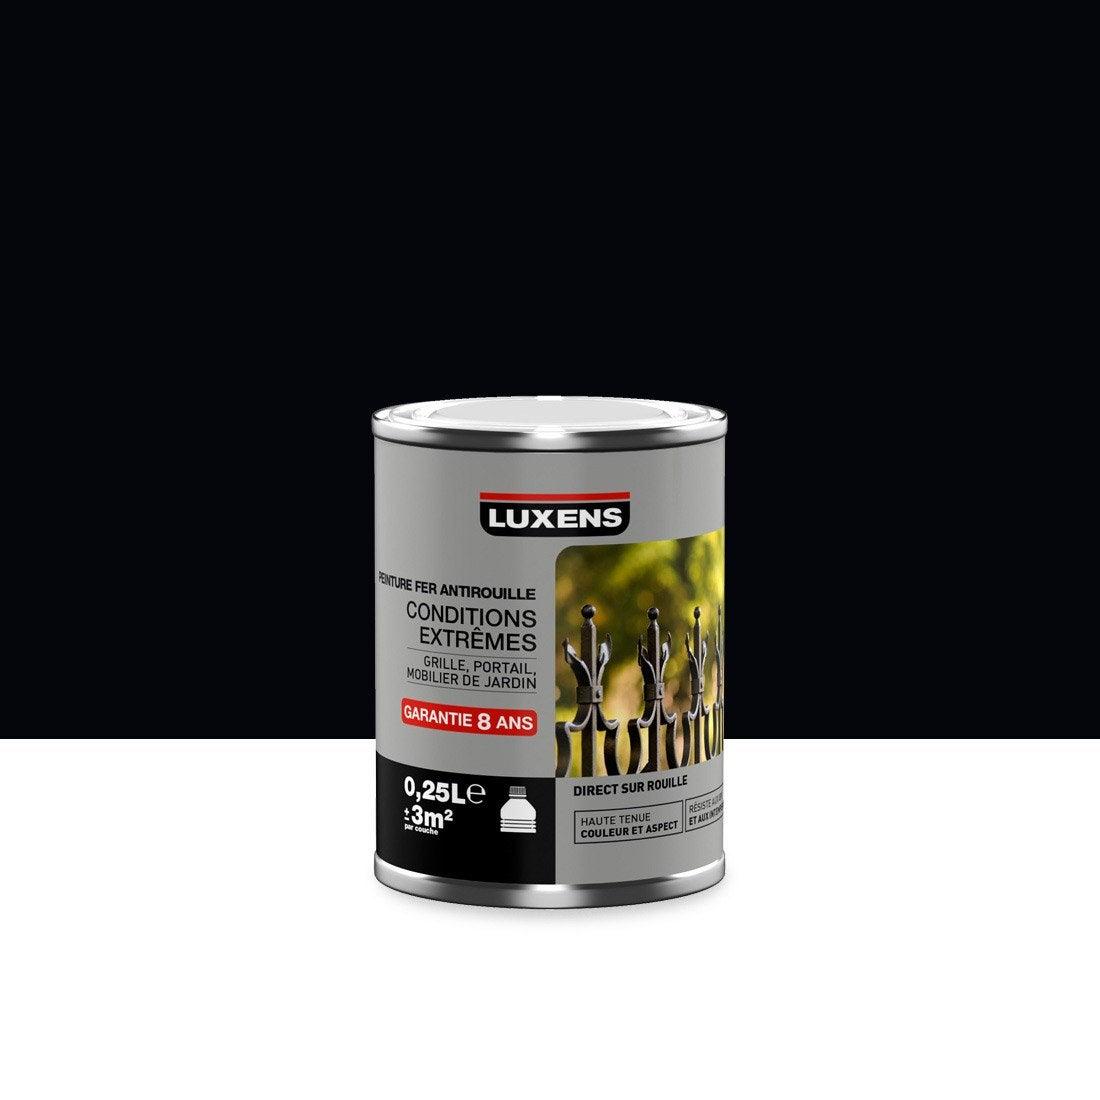 Peinture ferronnerie ext rieur antirouille luxens noir - Peinture tableau noir leroy merlin ...